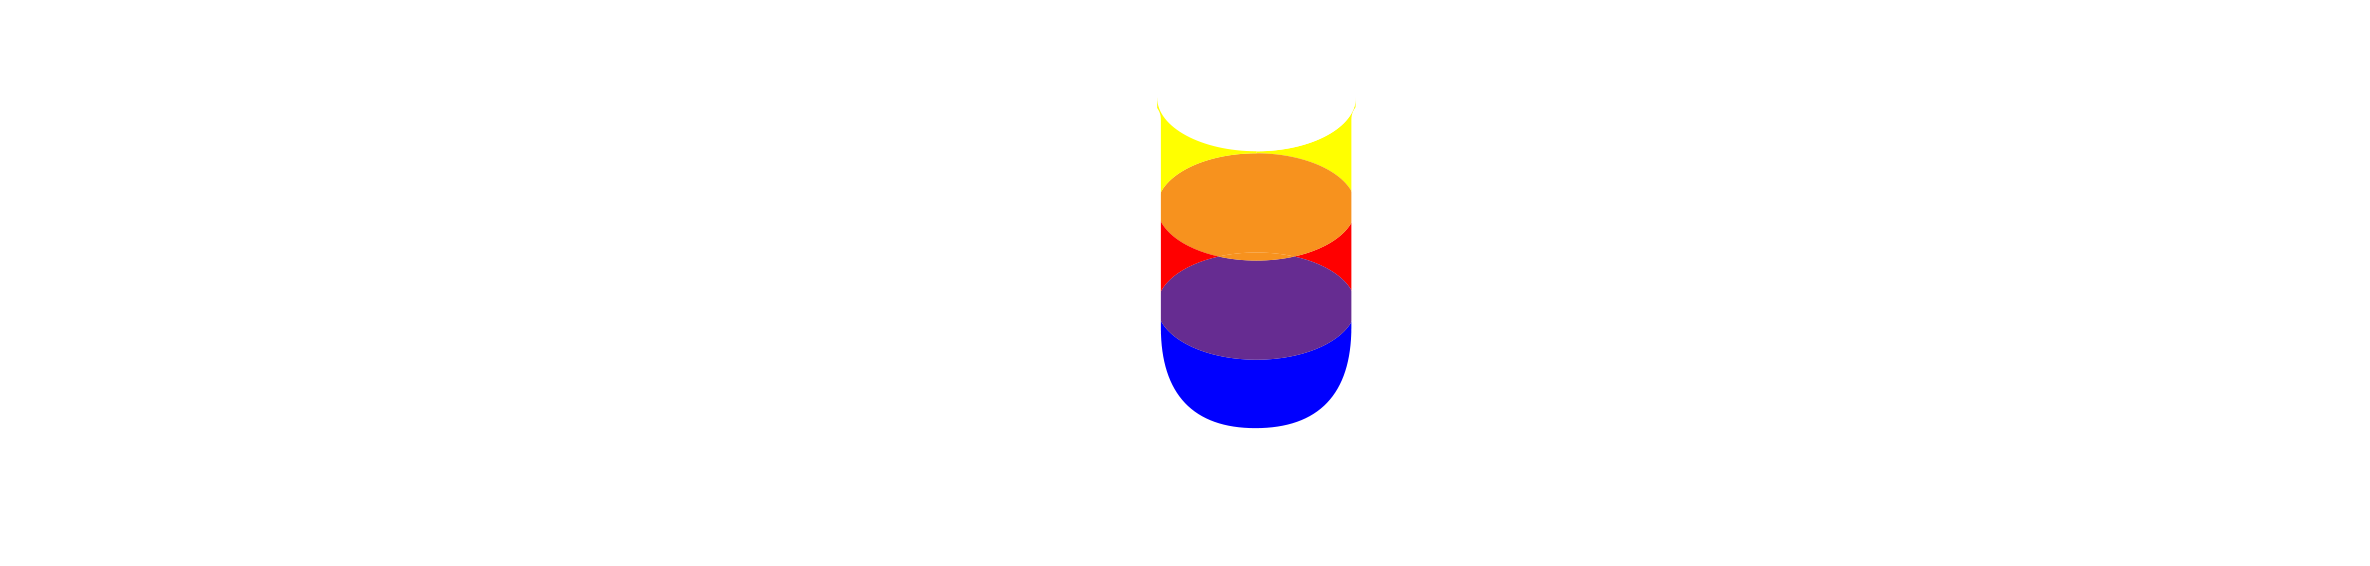 Volume-Logo-Design-1